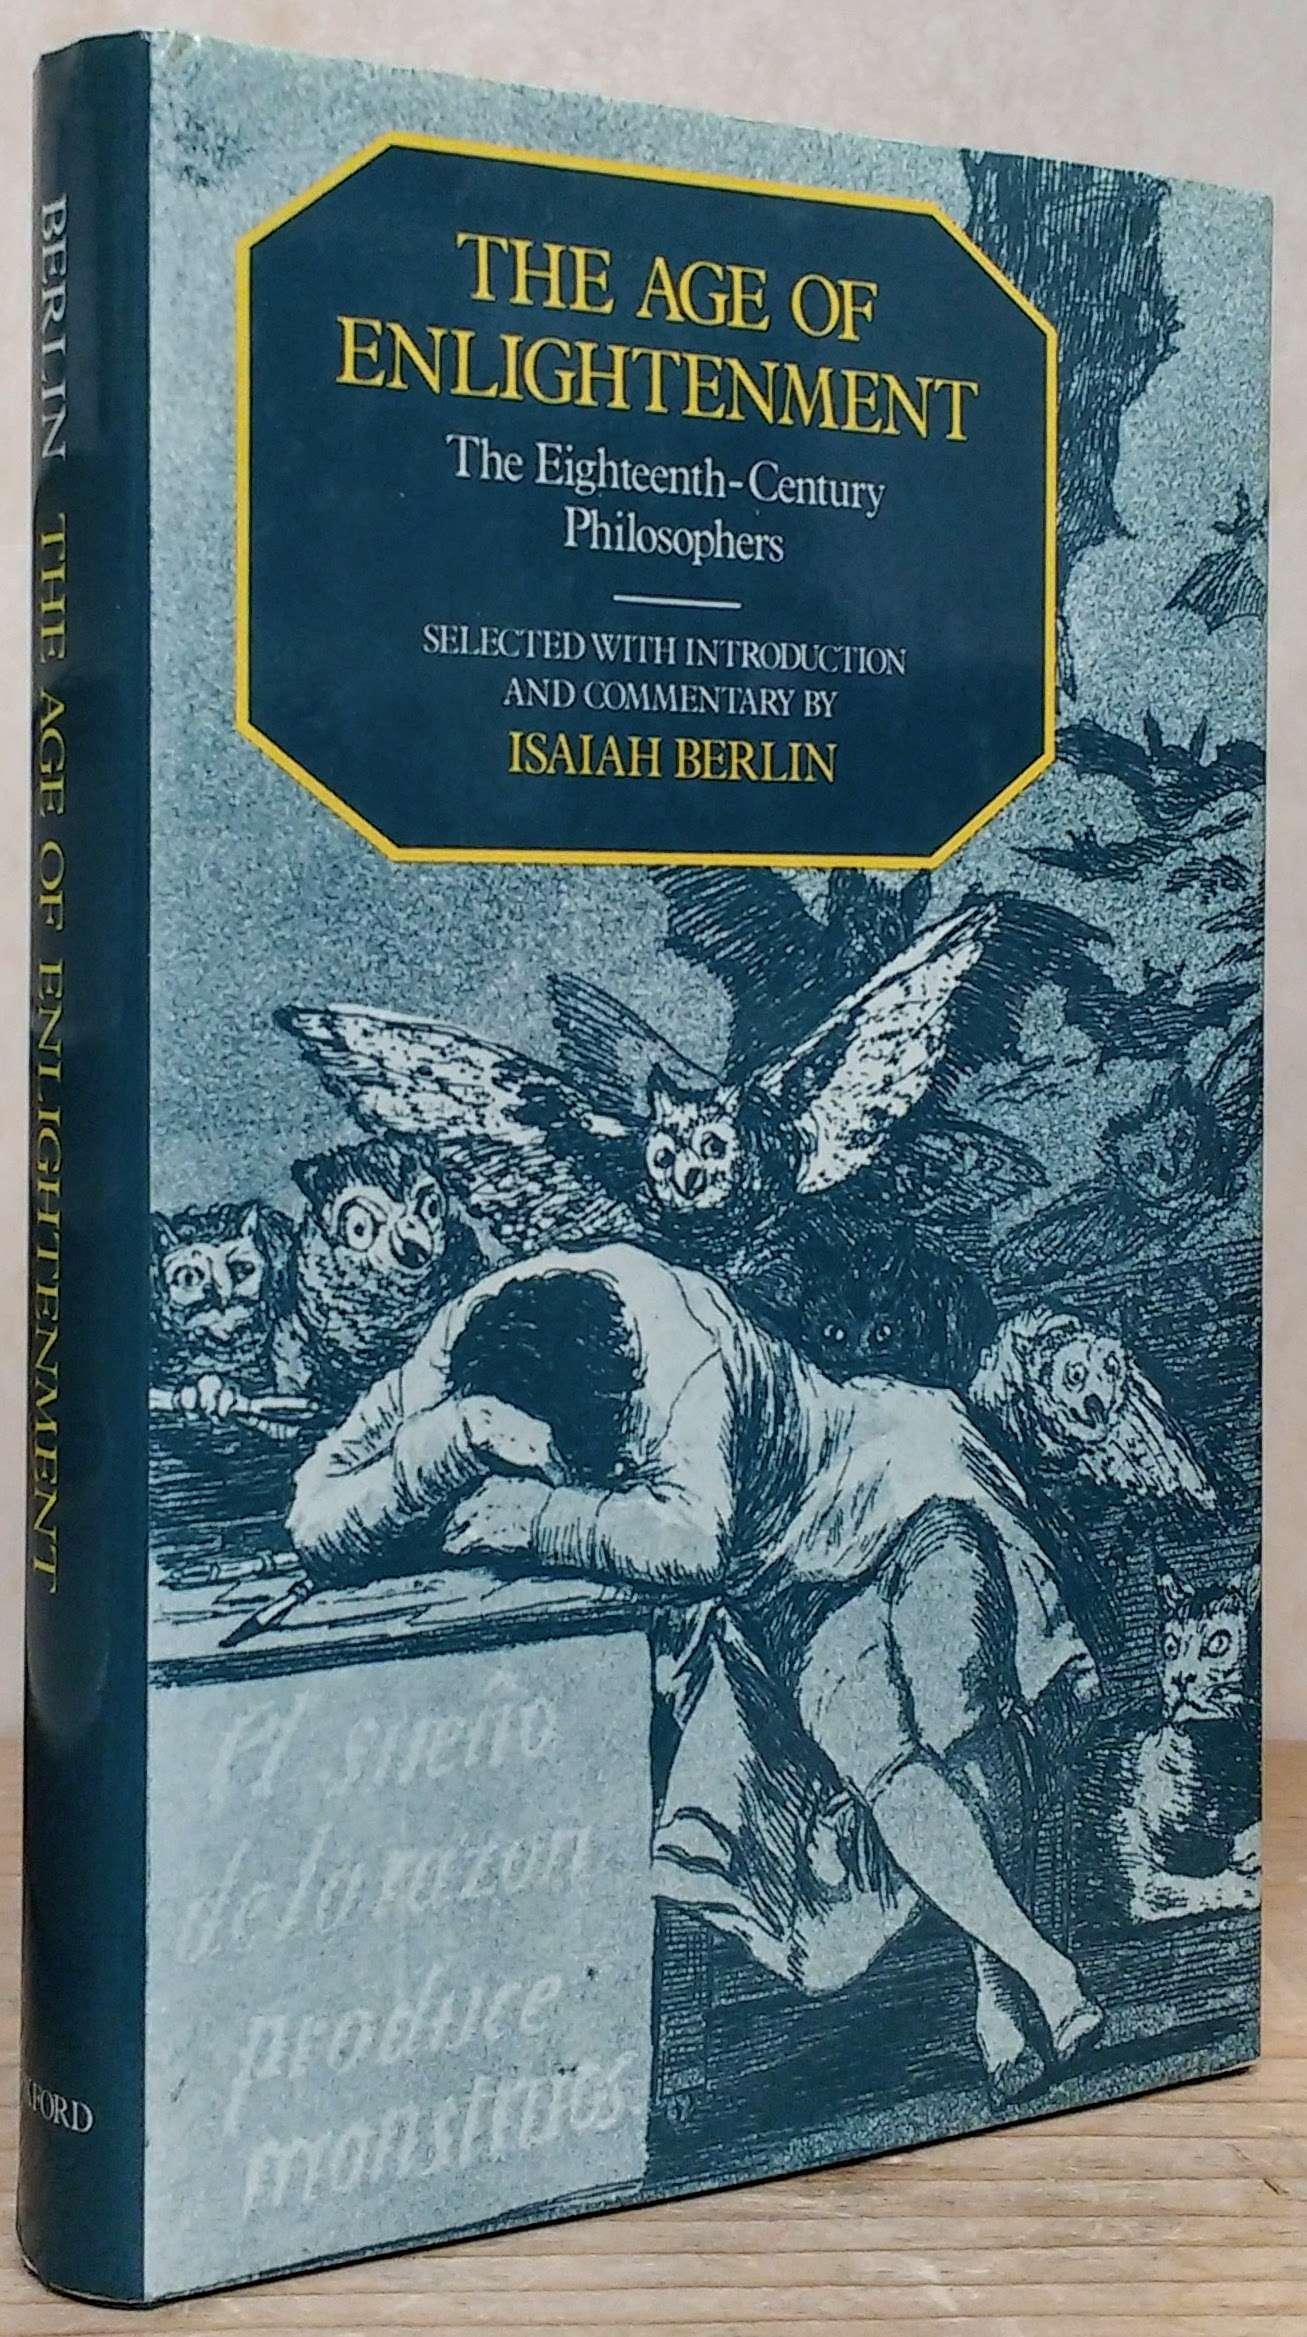 The Age of Enlightenment: The Eighteenth Century Philosophers, Berlin, Isaiah [Editor]